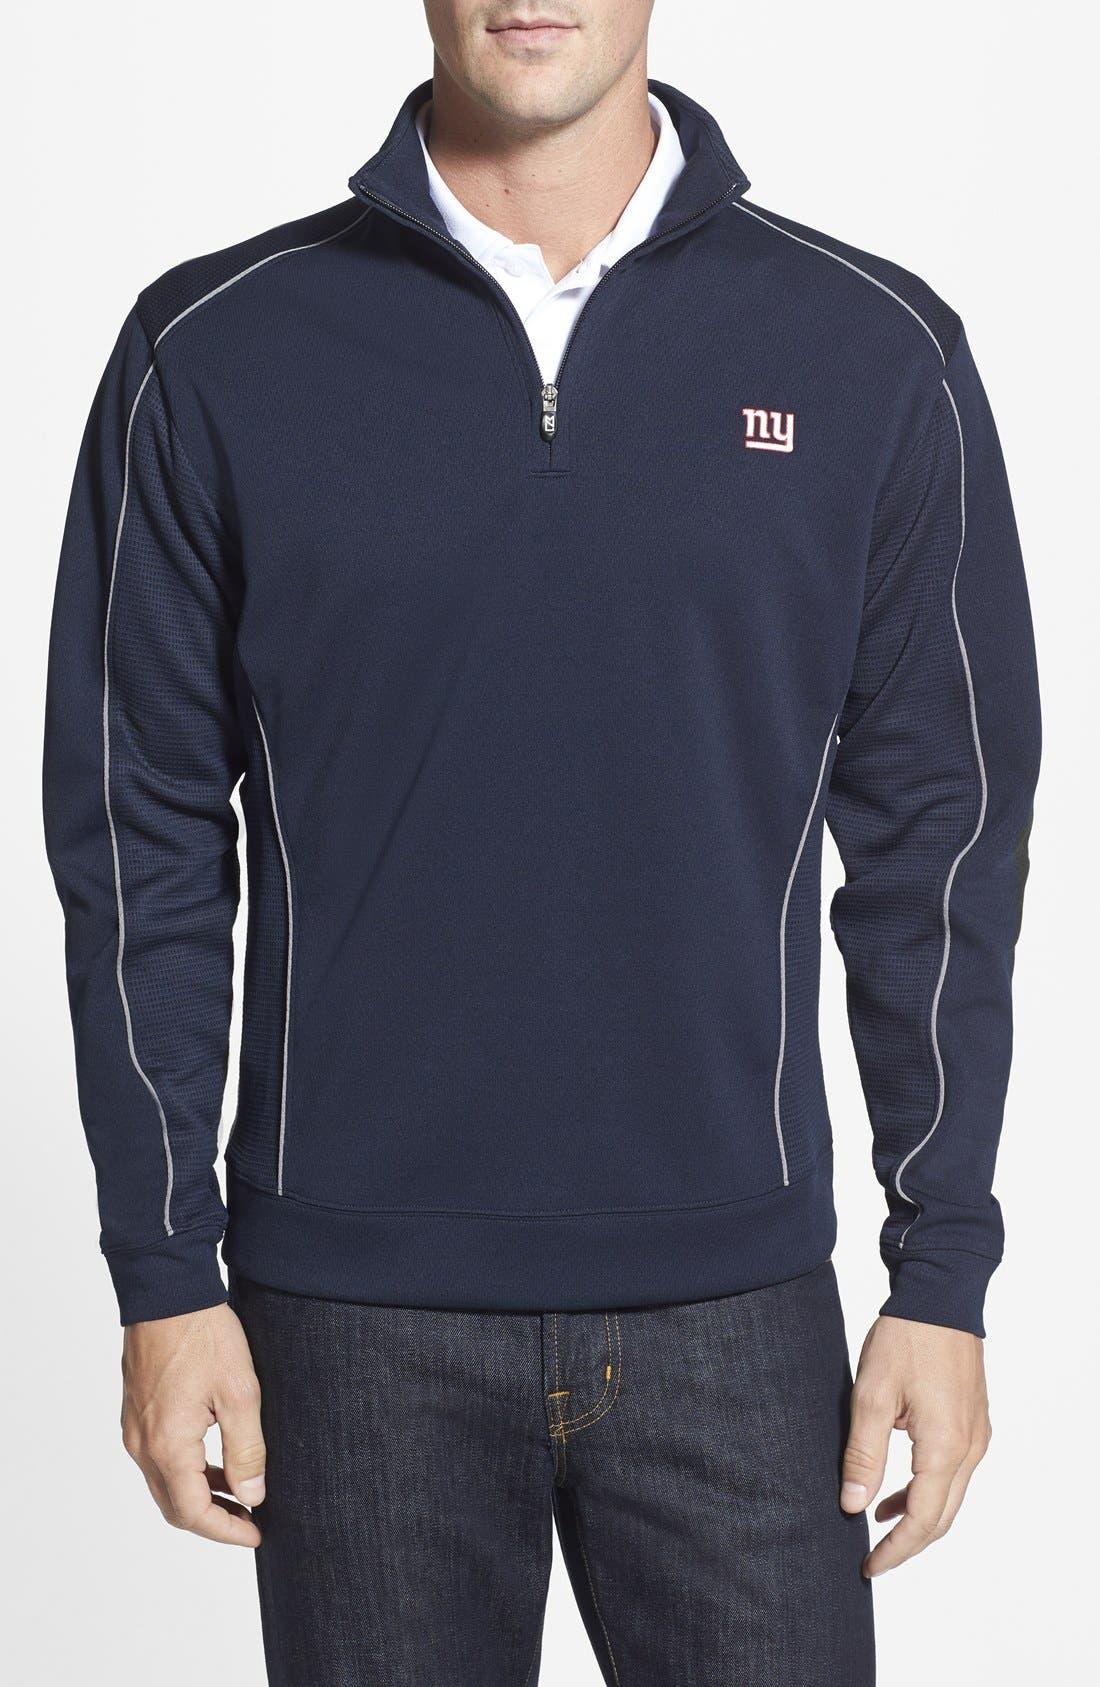 Alternate Image 1 Selected - Cutter & Buck New York Giants - Edge DryTec Moisture Wicking Half Zip Pullover